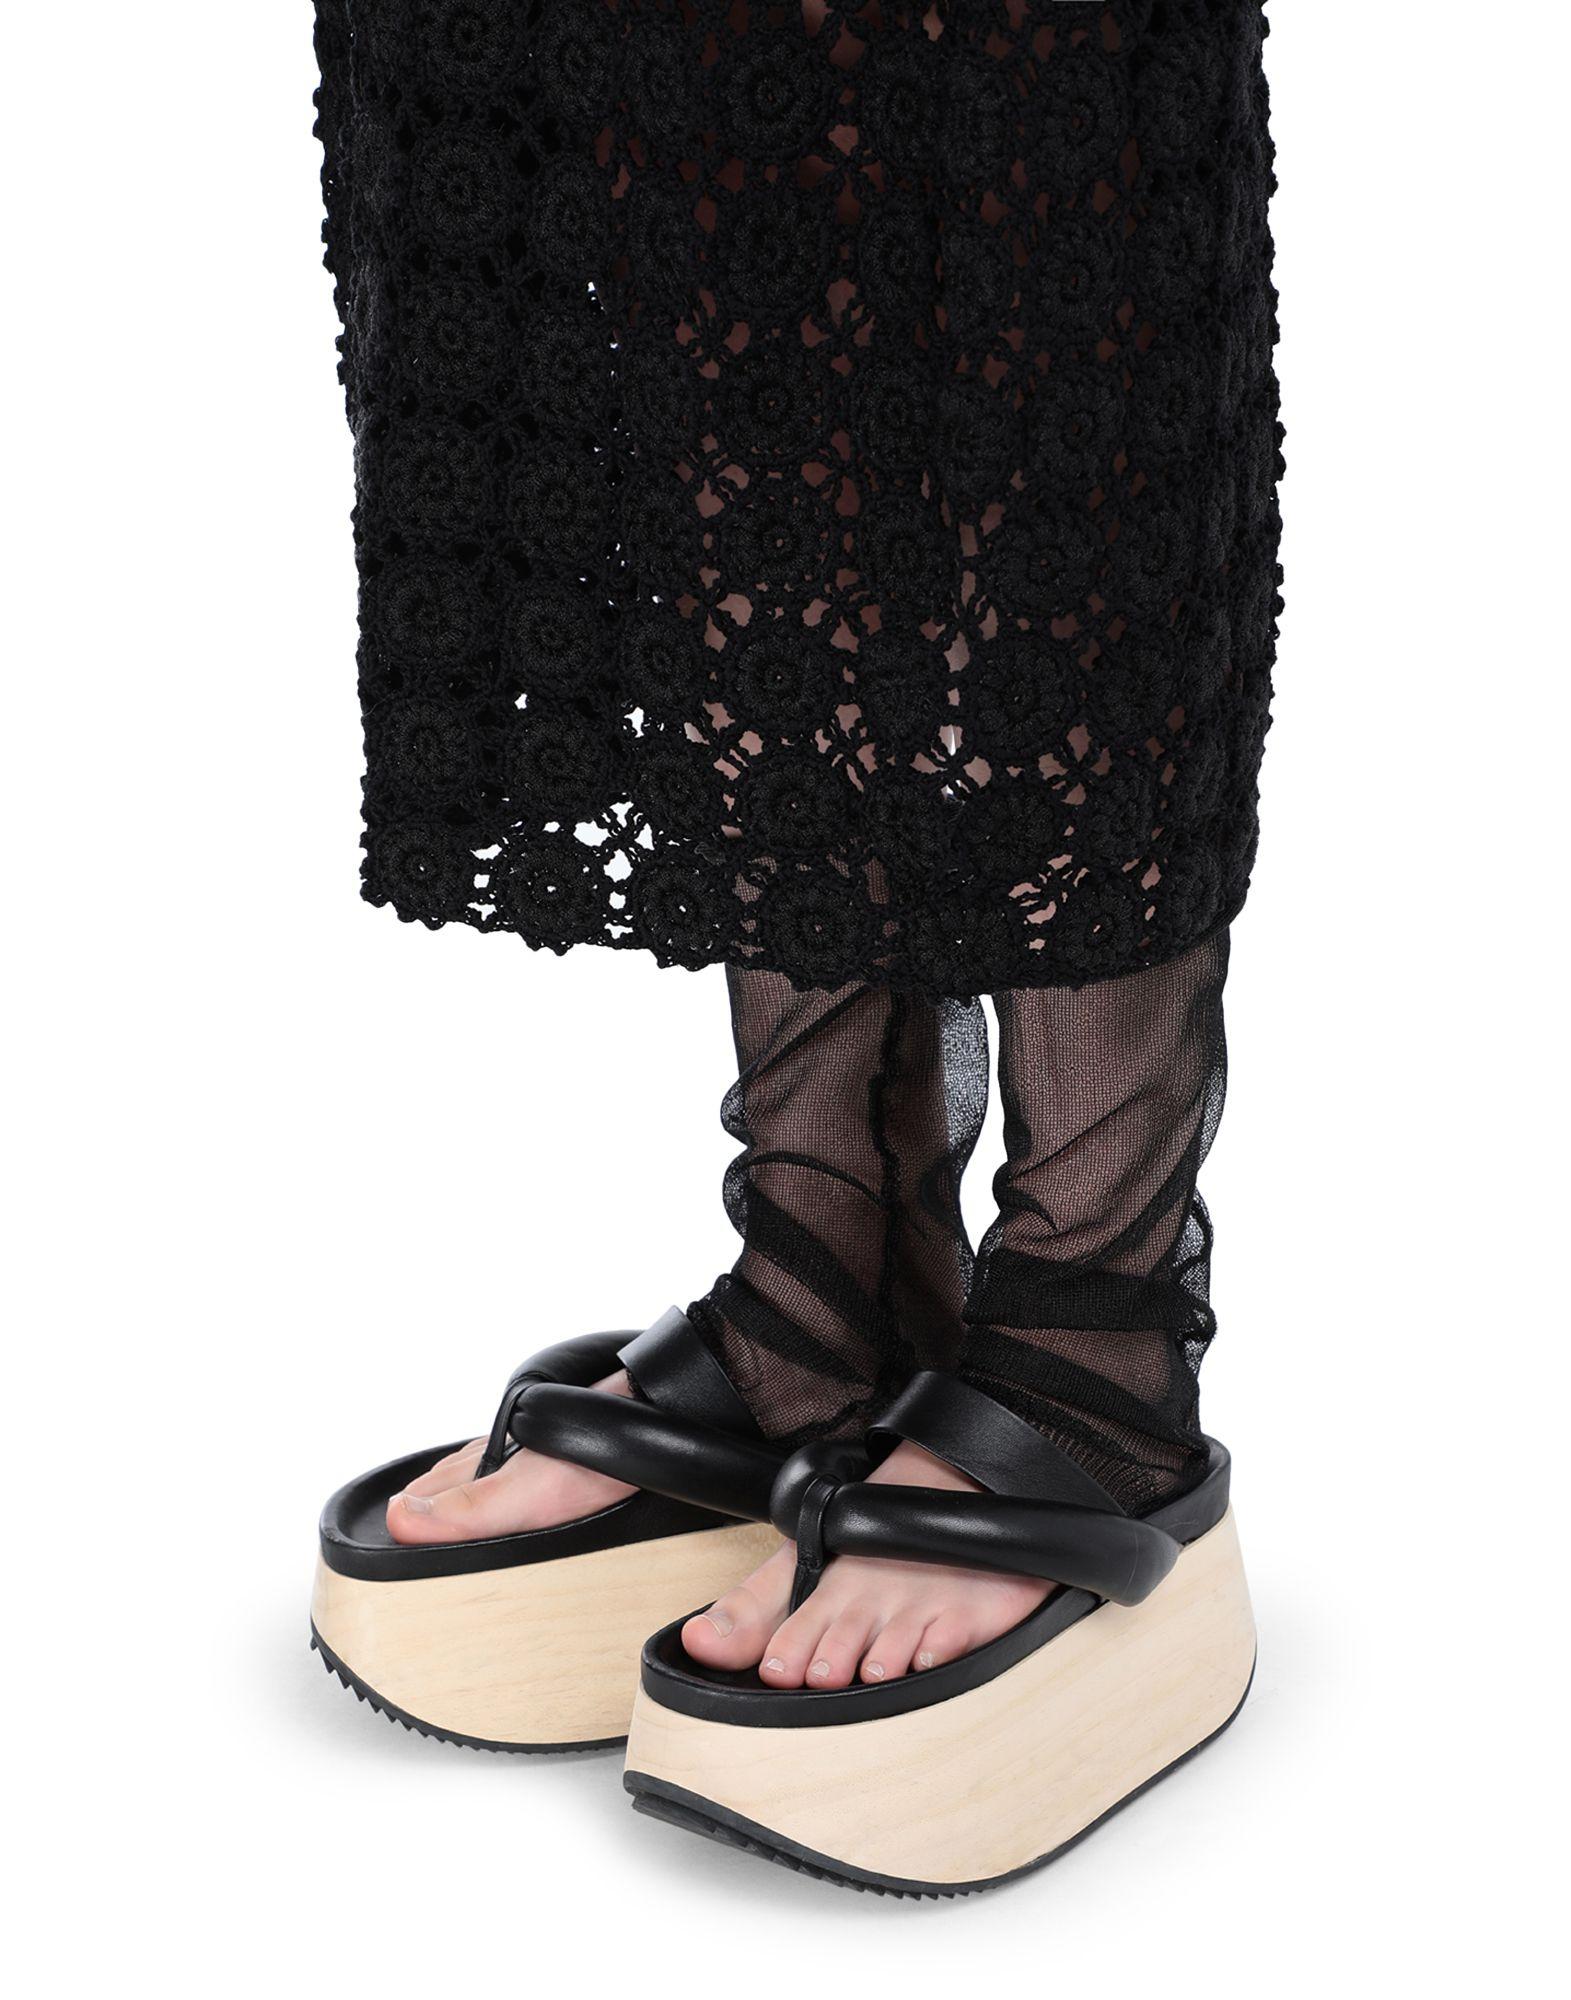 Sock - JIL SANDER Online Store